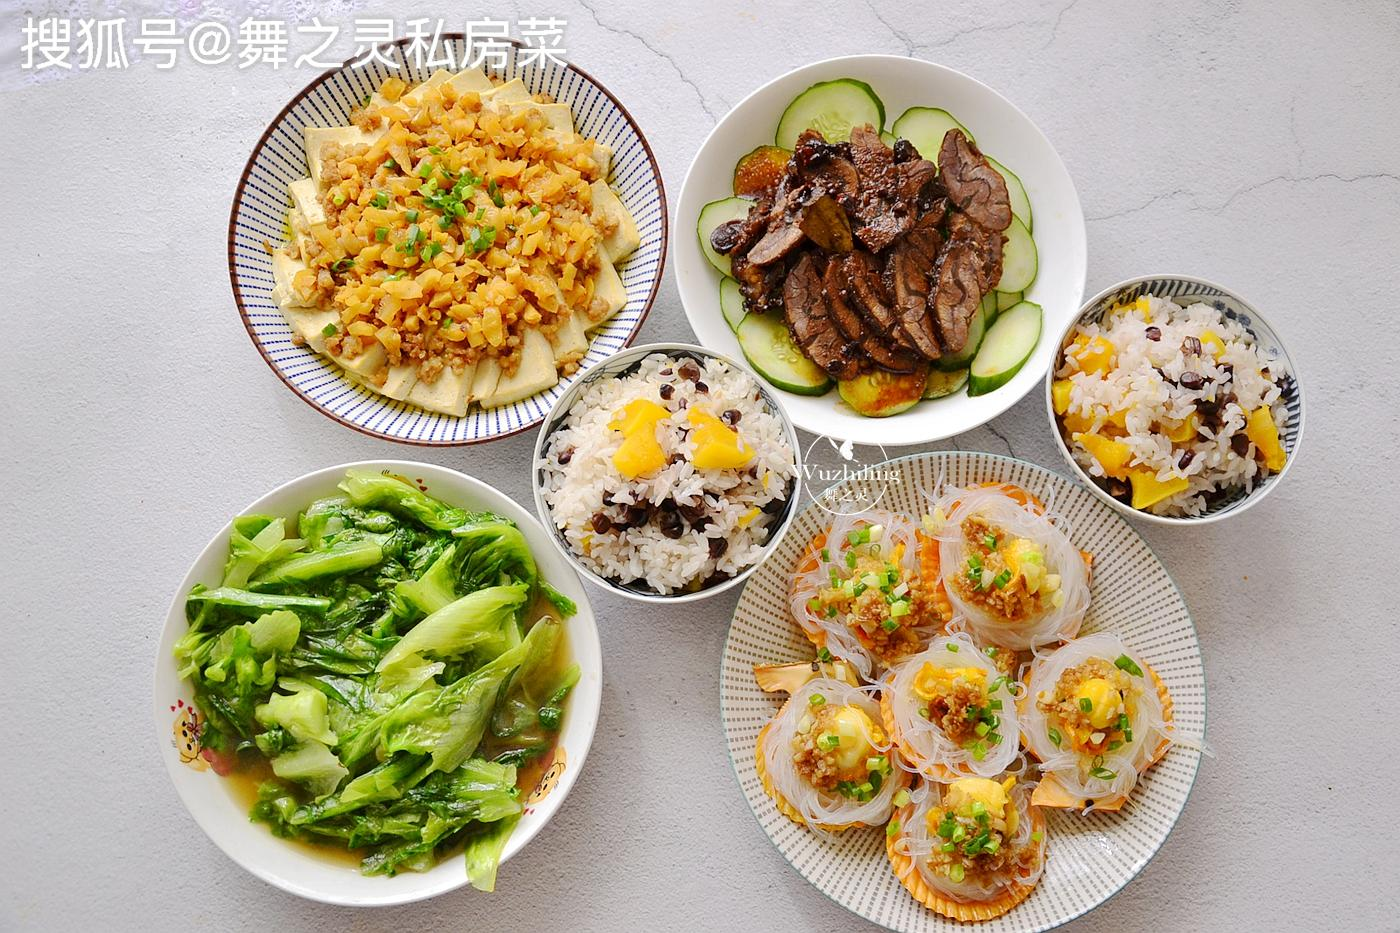 "<b>中元节也是""鬼节"",午餐吃出仪式感,营养又好吃,晚上不出门</b>"